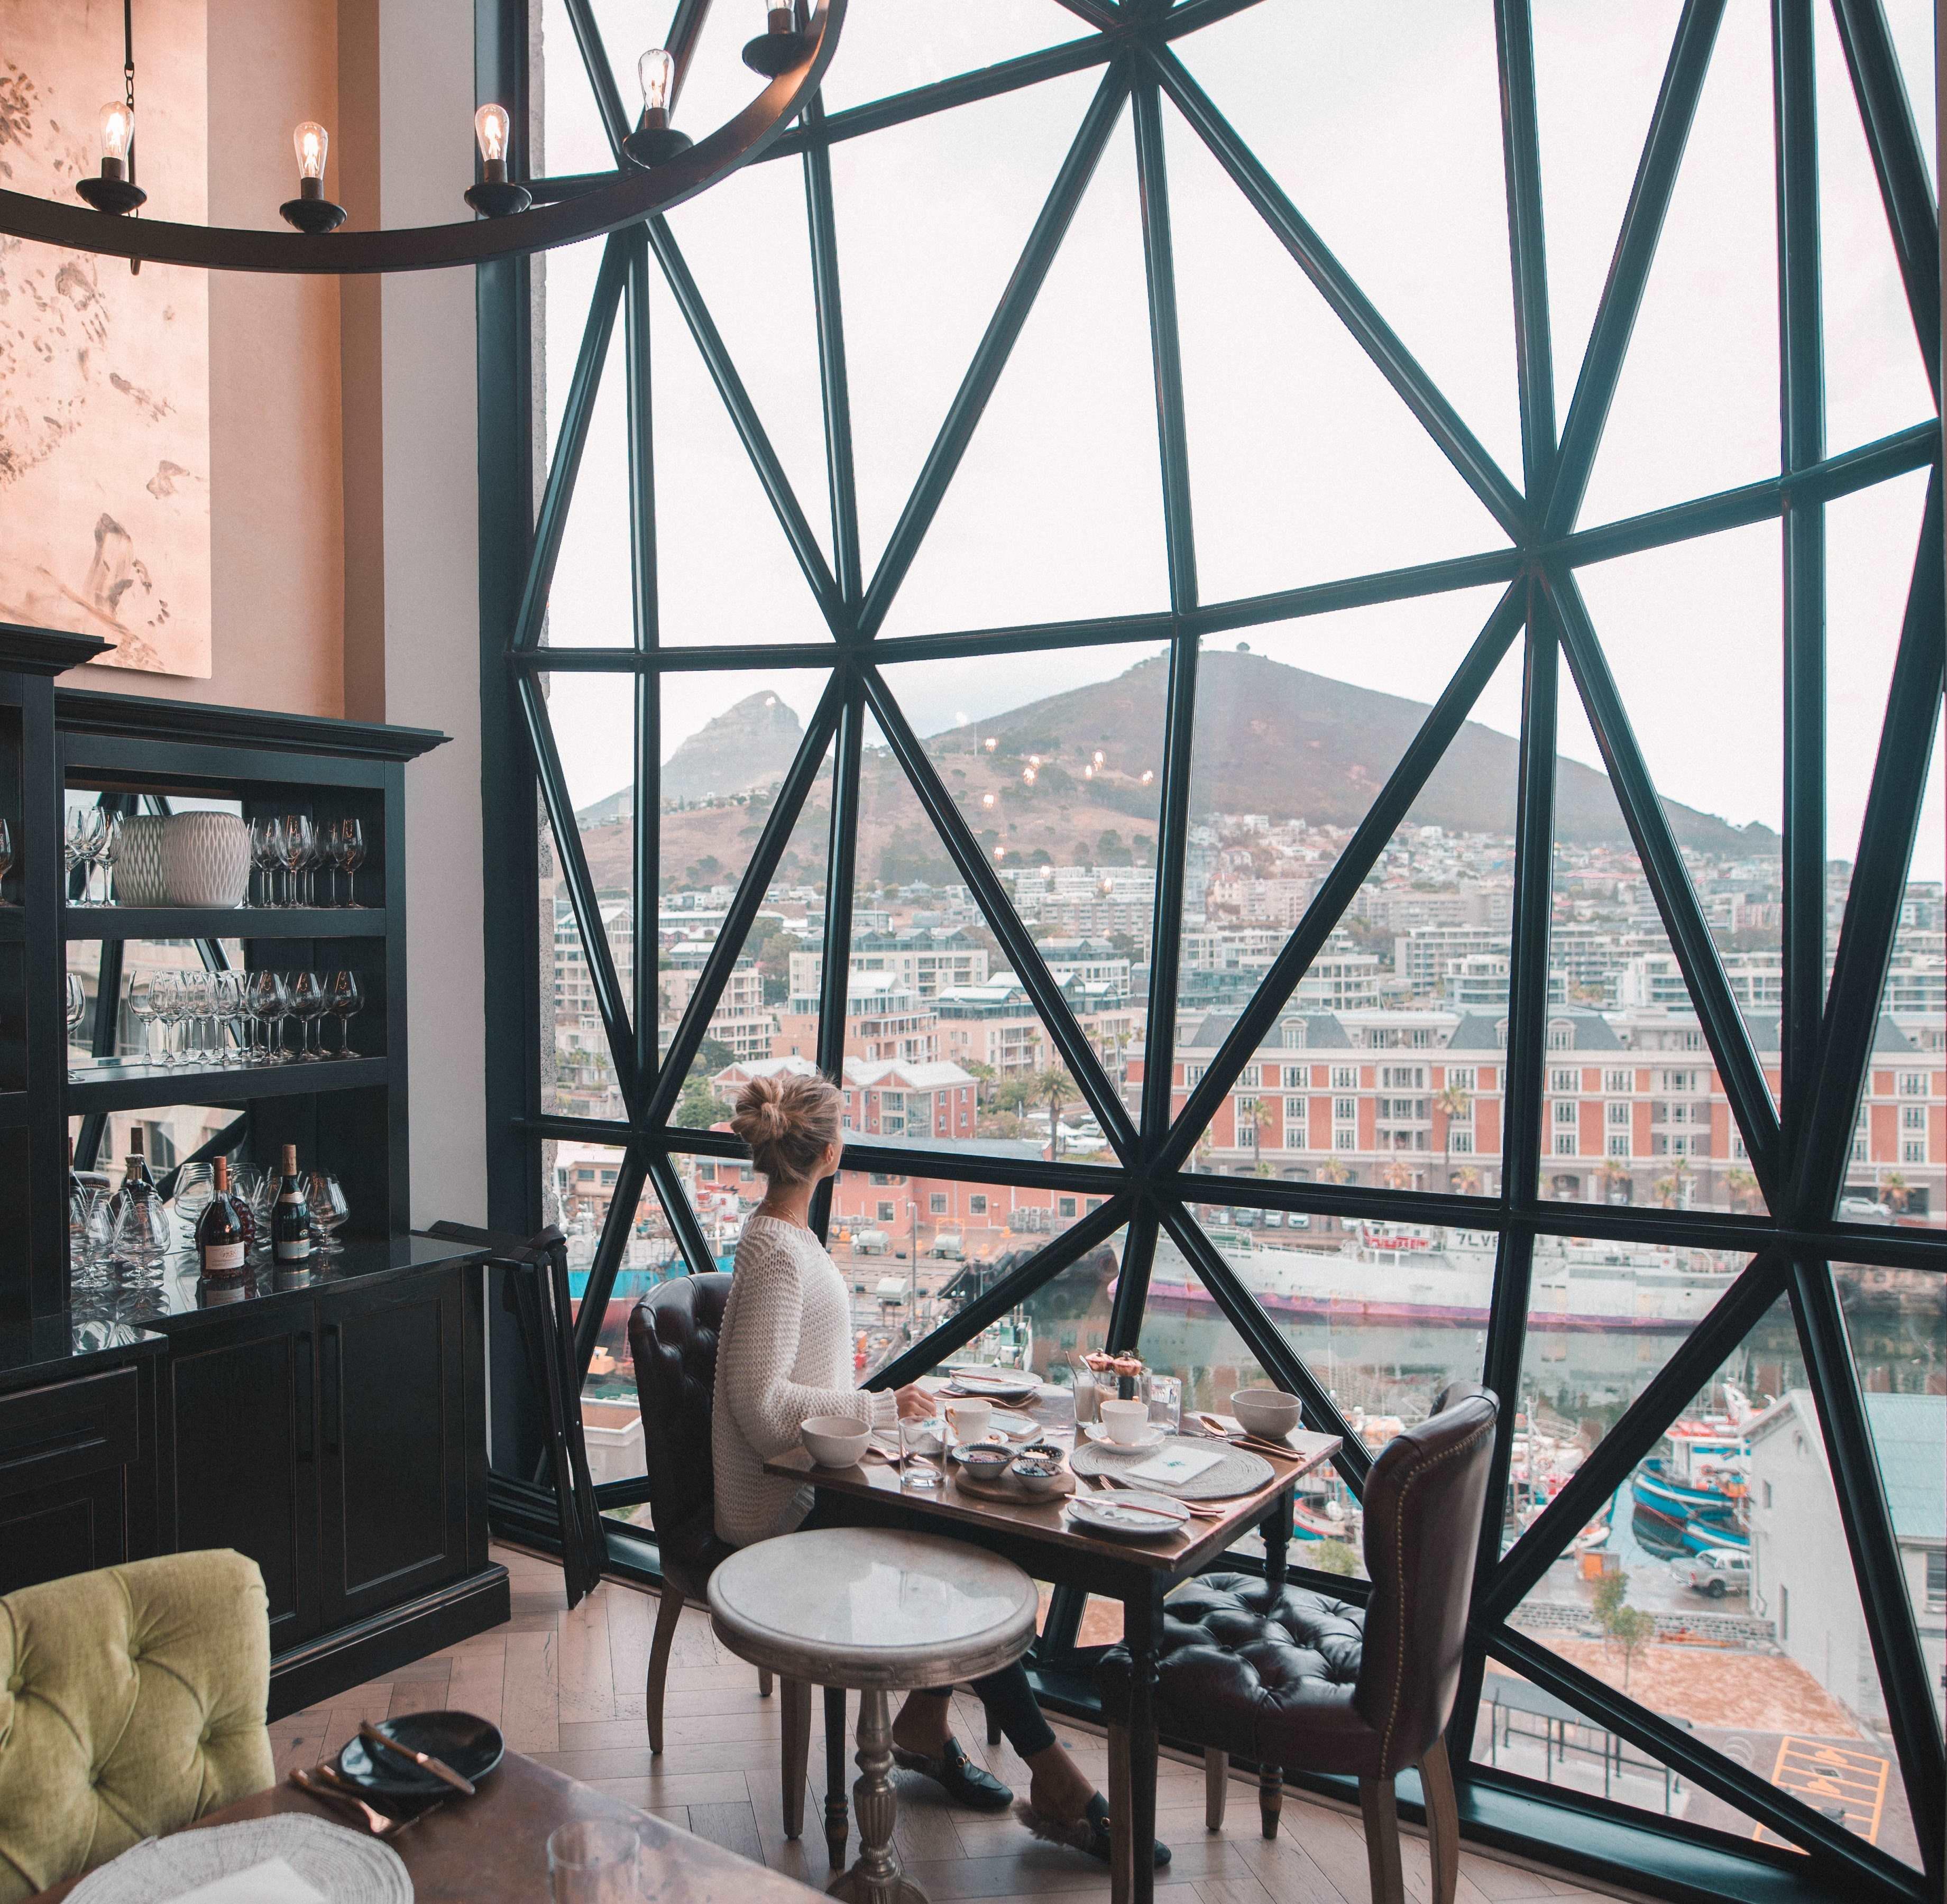 The Granary Café